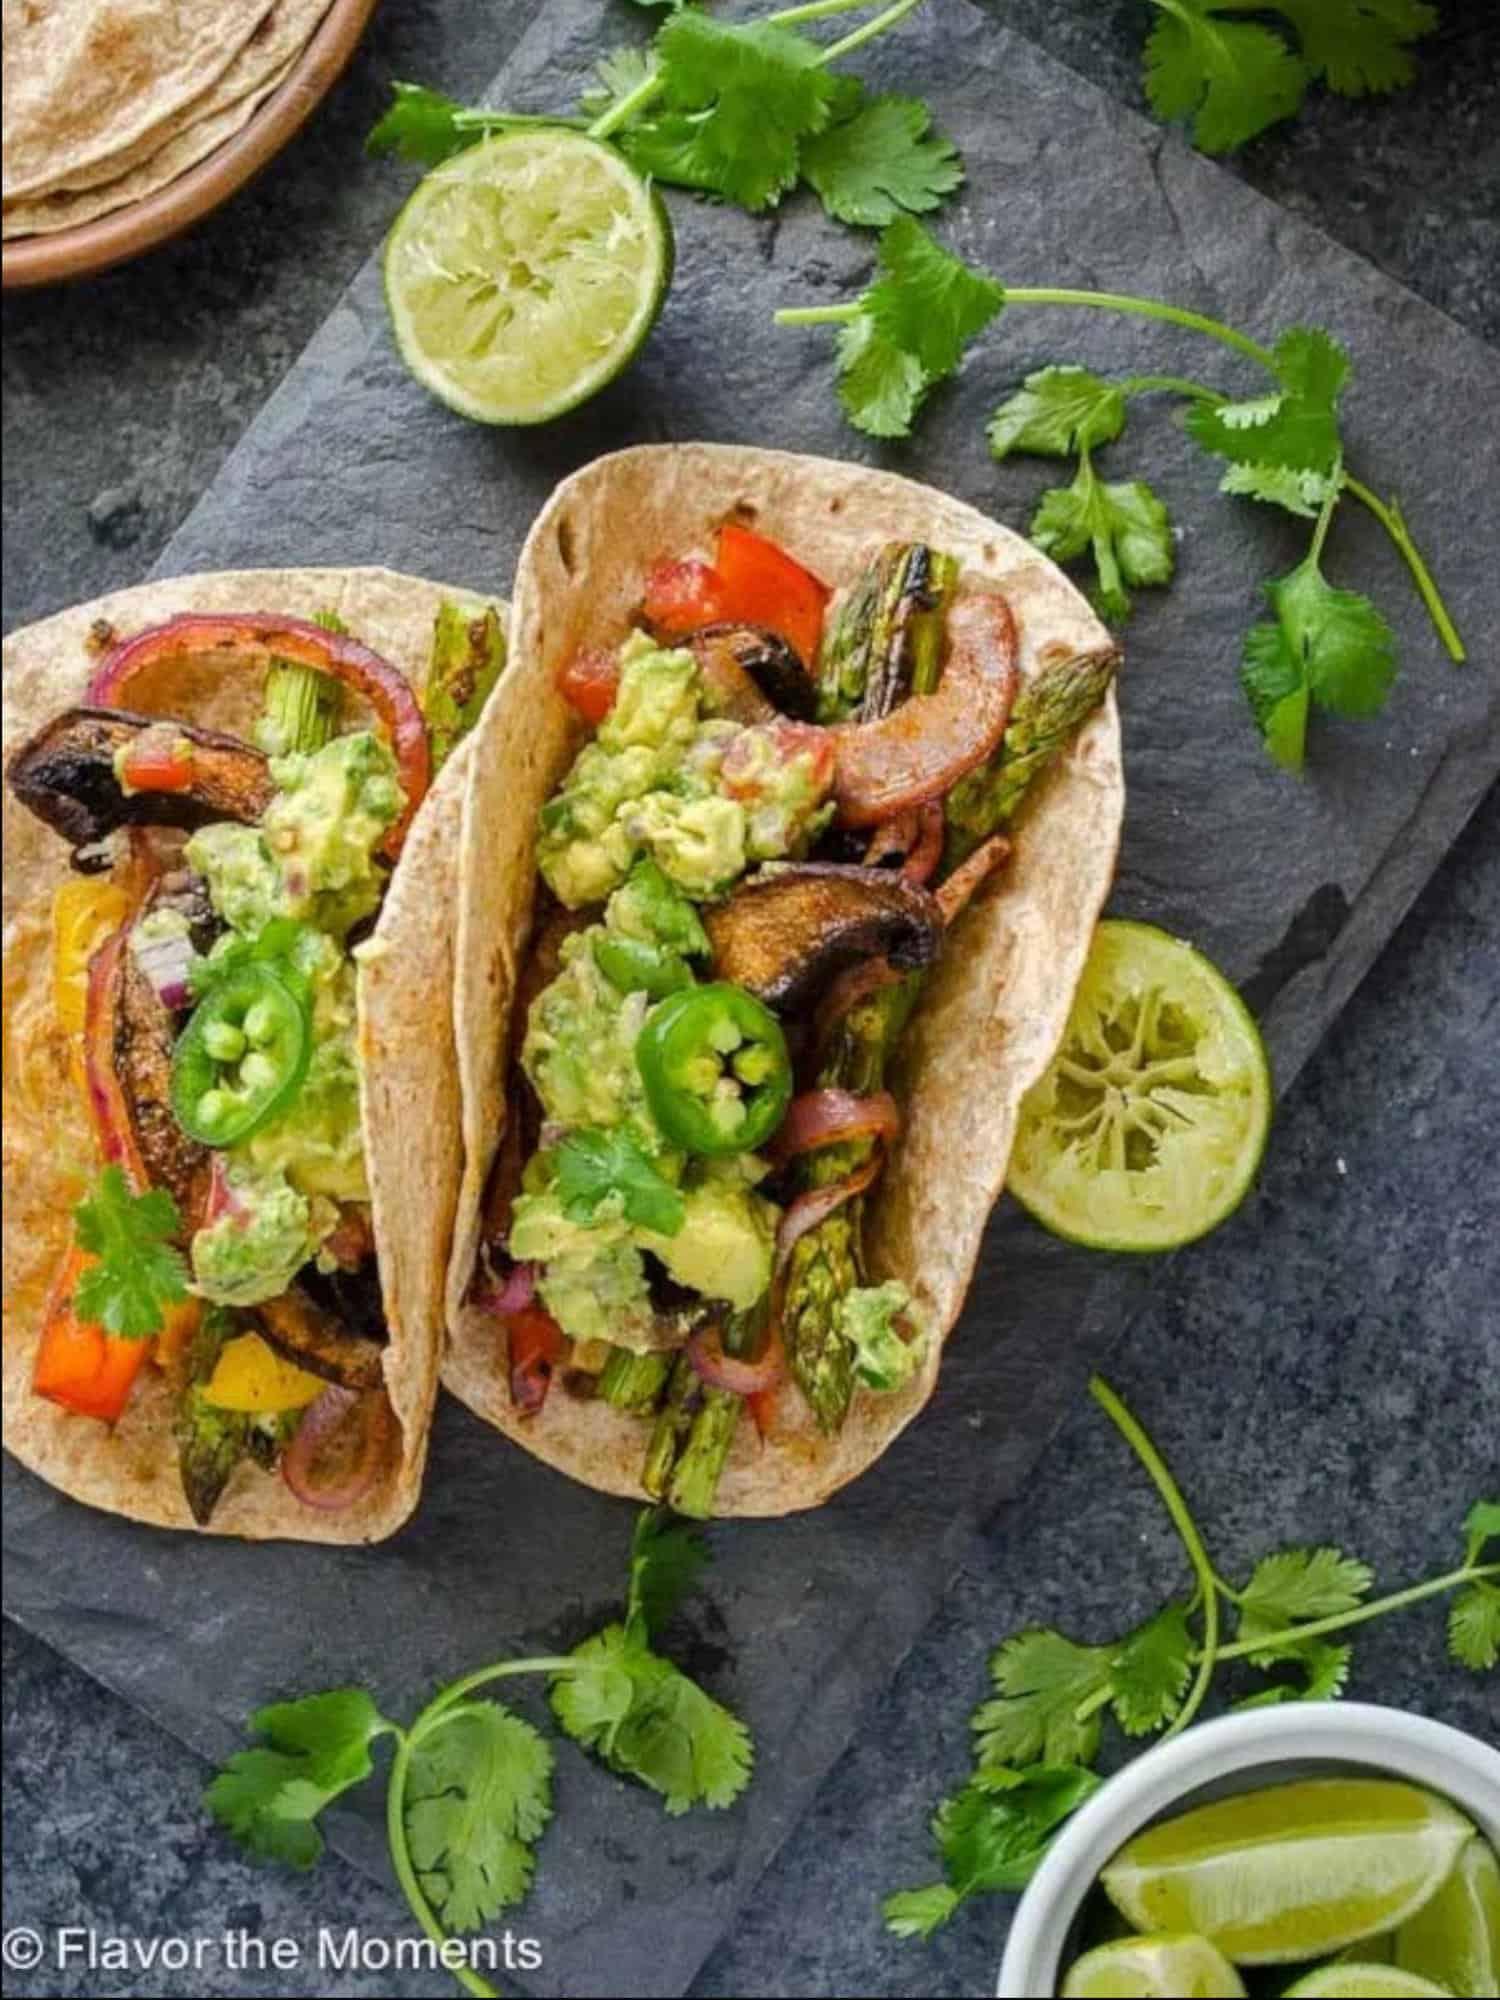 mushroom and asparagus inside taco shells with lime and cilantro garnish around them.